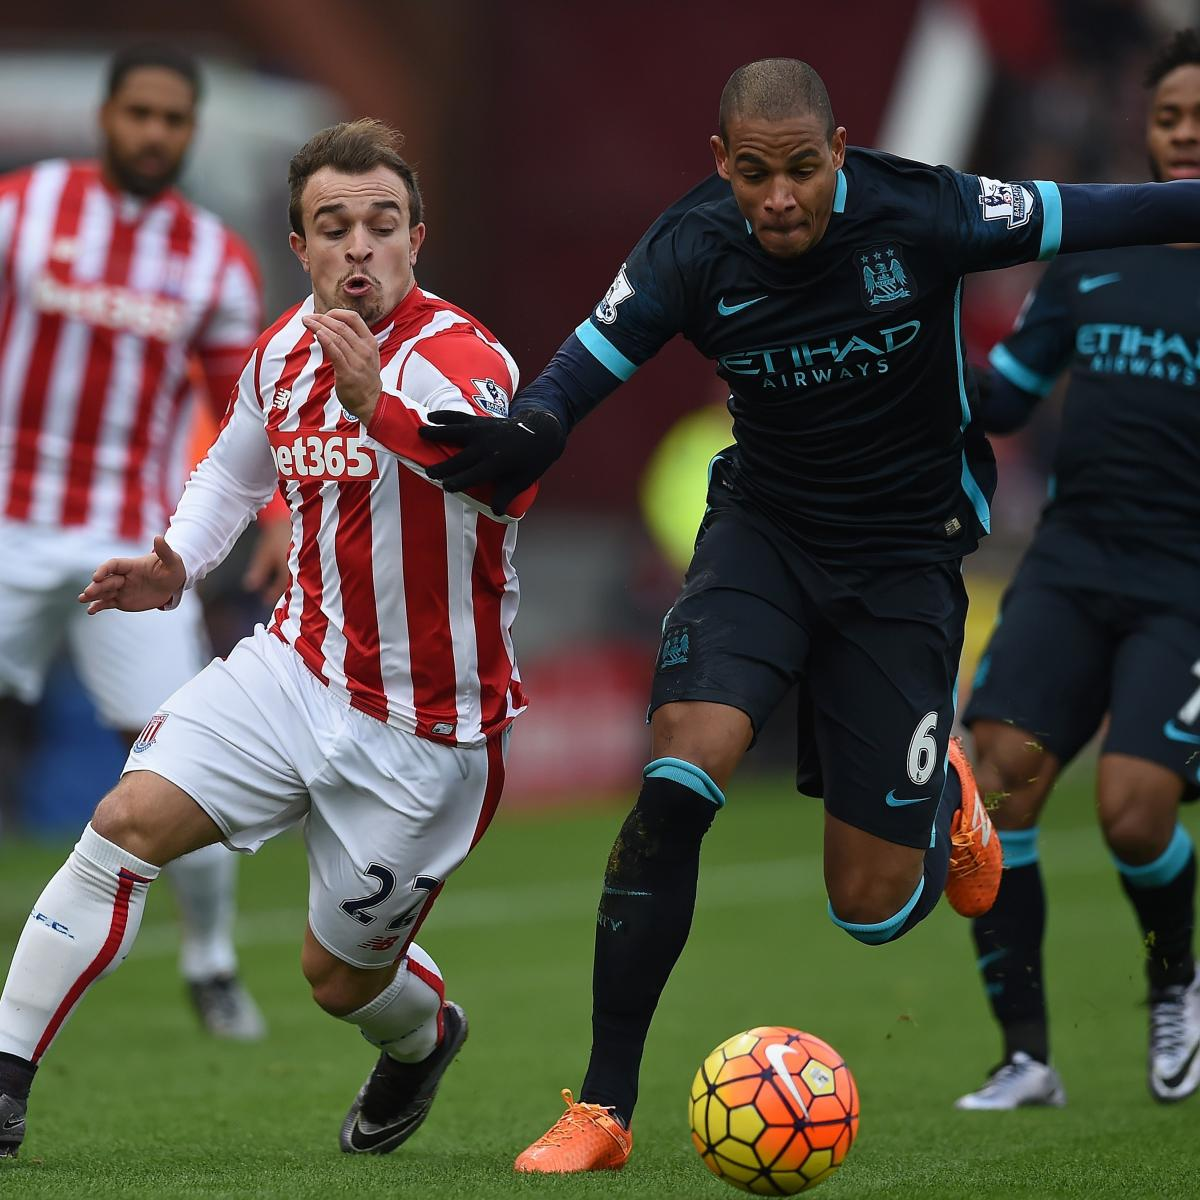 Psg Vs Manchester City Live Score Highlights From: Stoke City Vs. Manchester City: Live Score, Highlights